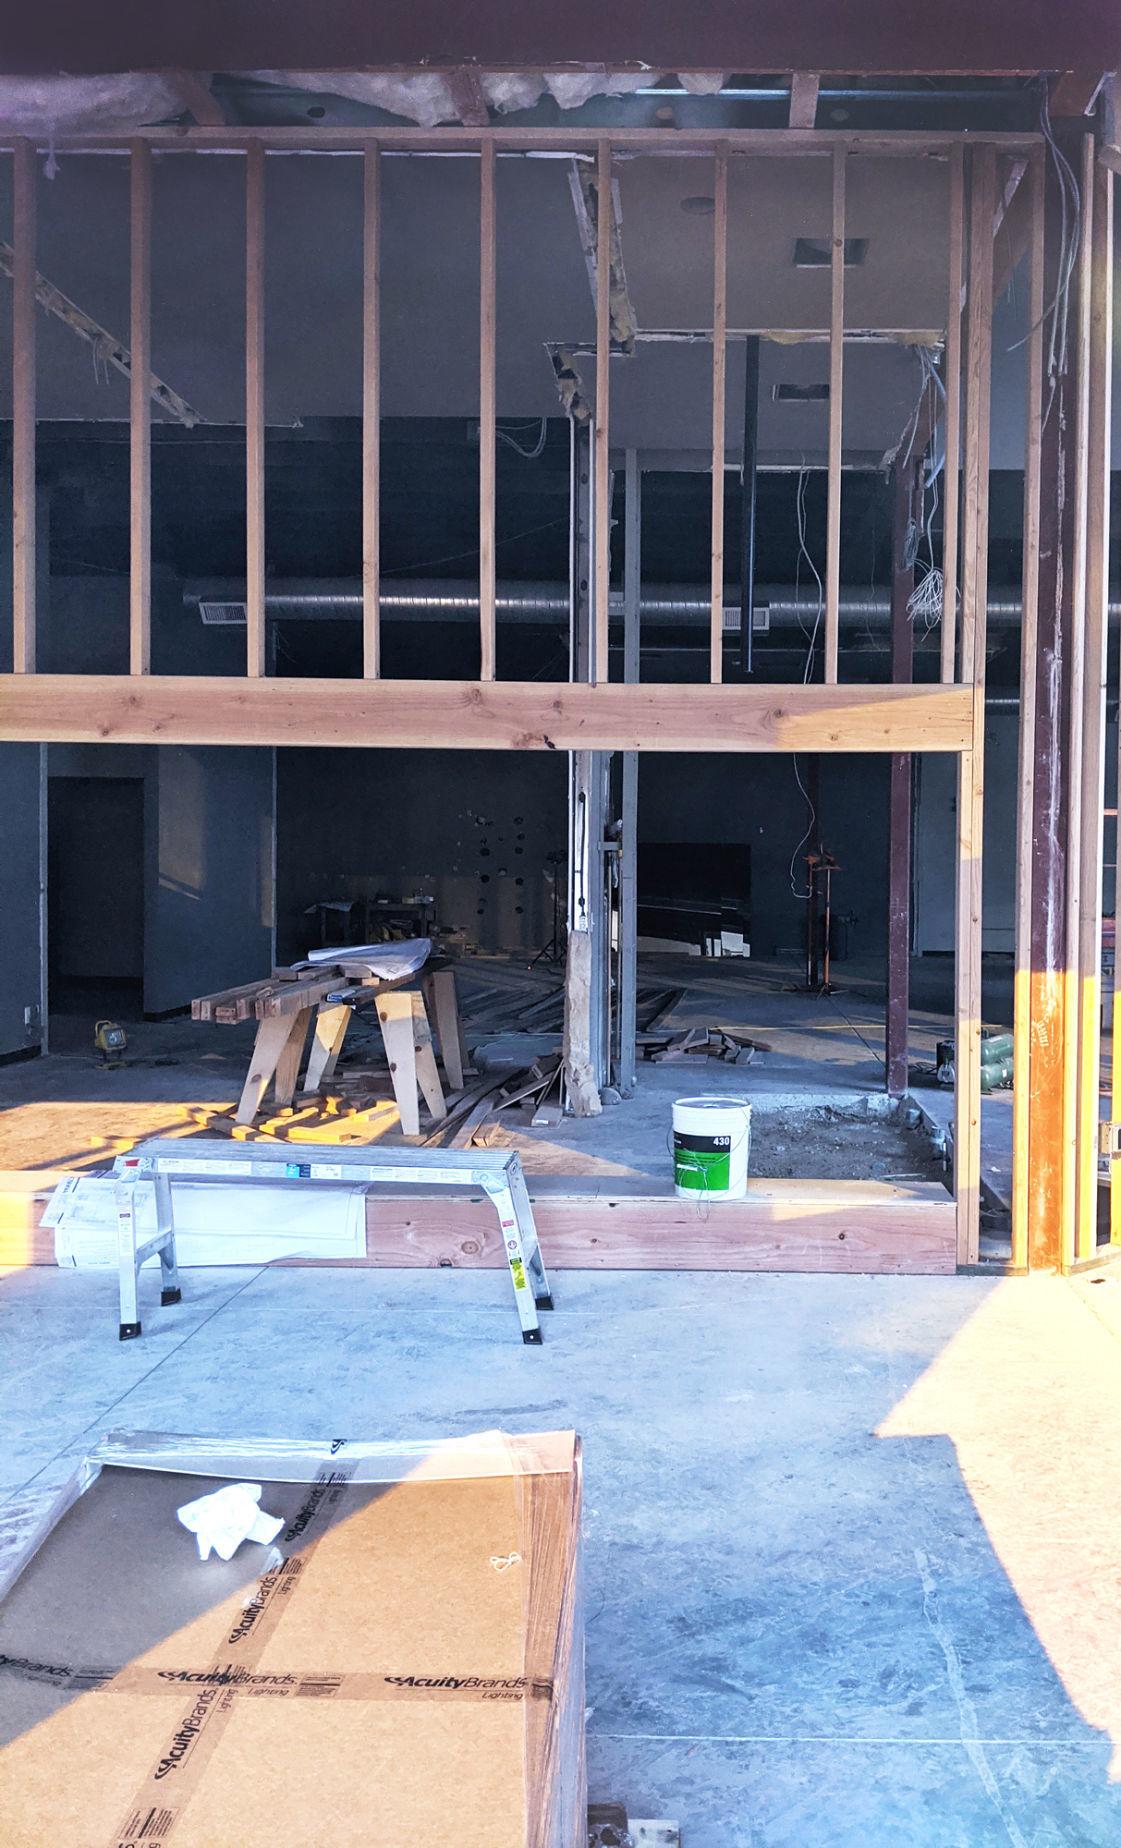 New Kuna Post Office construction